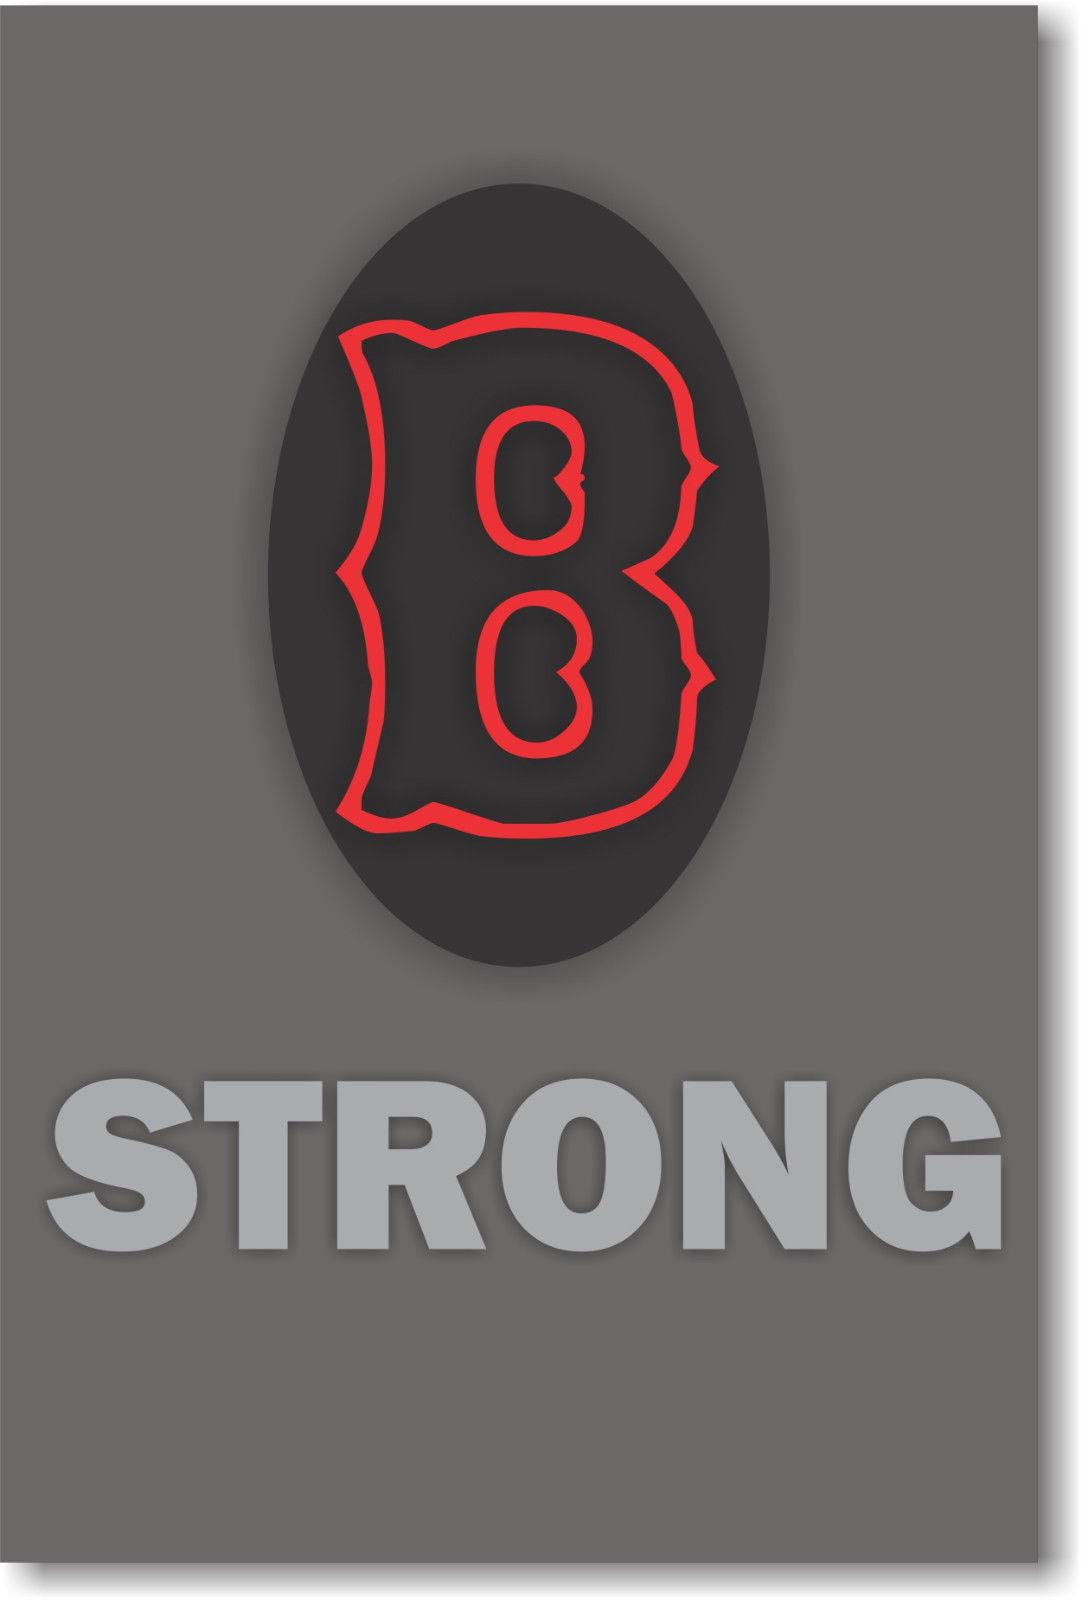 173502  B  Strong Patriotic BOSTON MASSACHUSETTS USA Decor WALL PRINT POSTER US